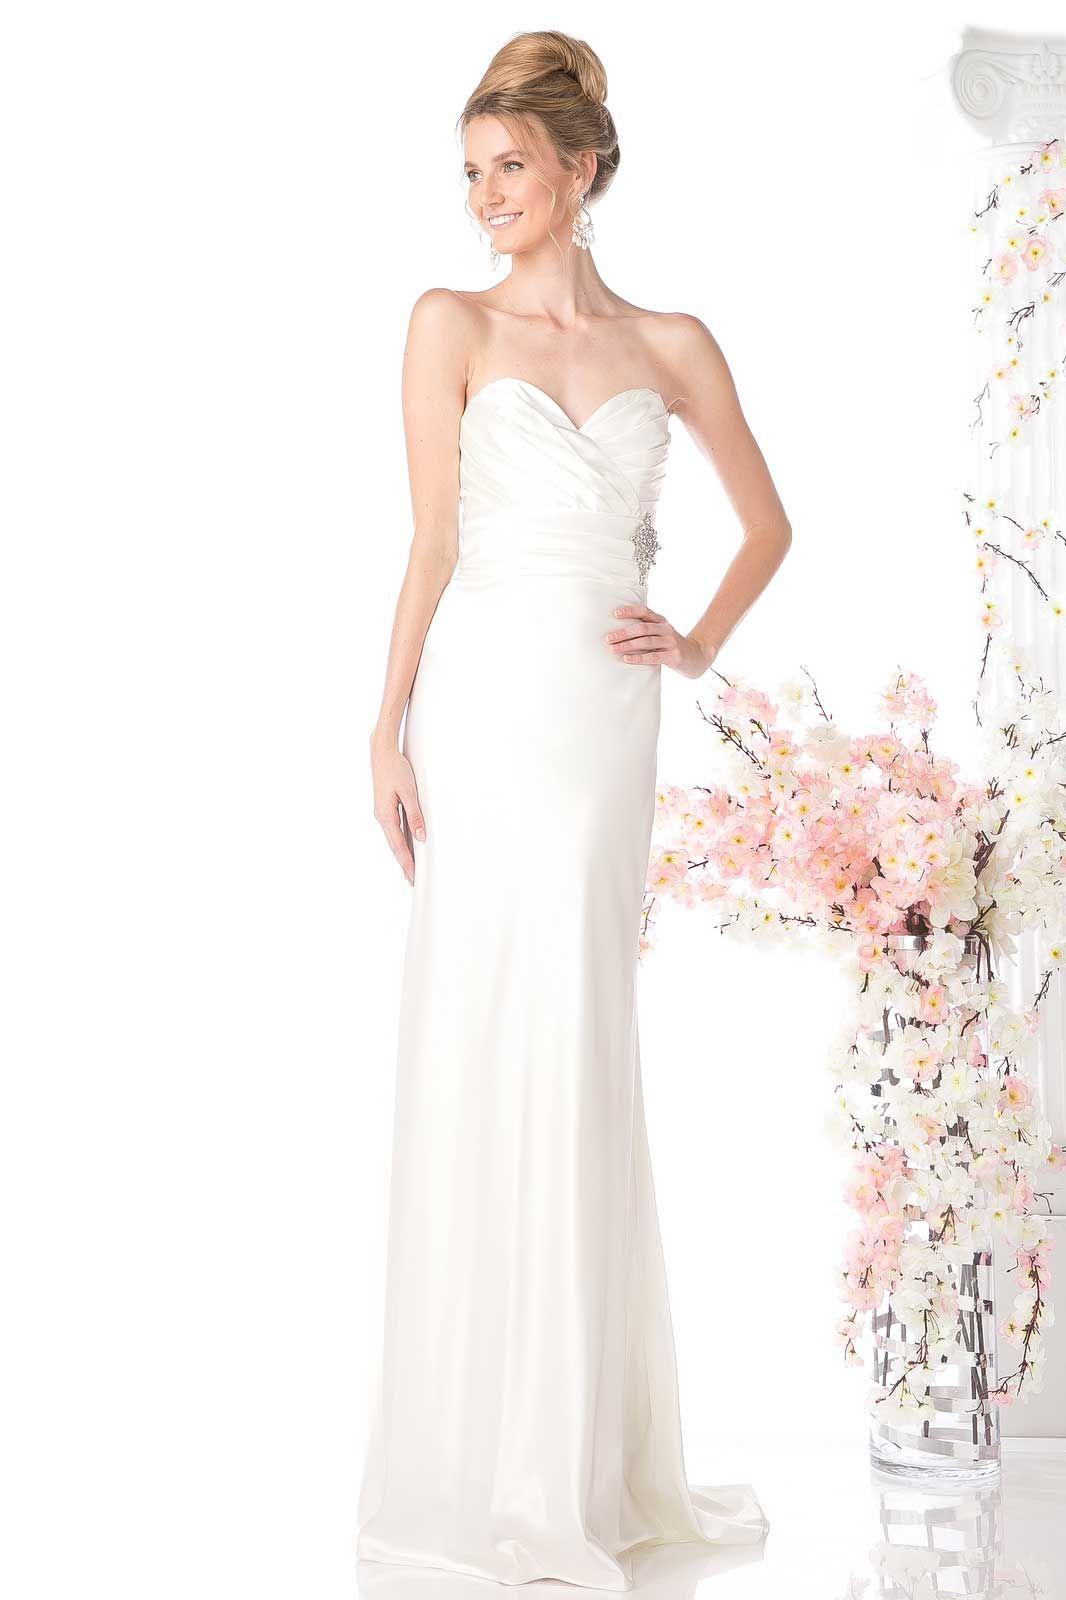 WEDDING DRESSES ONLINE AUSTRALIA: ENVIOUS FASHIONS #bridalshopsperth ...